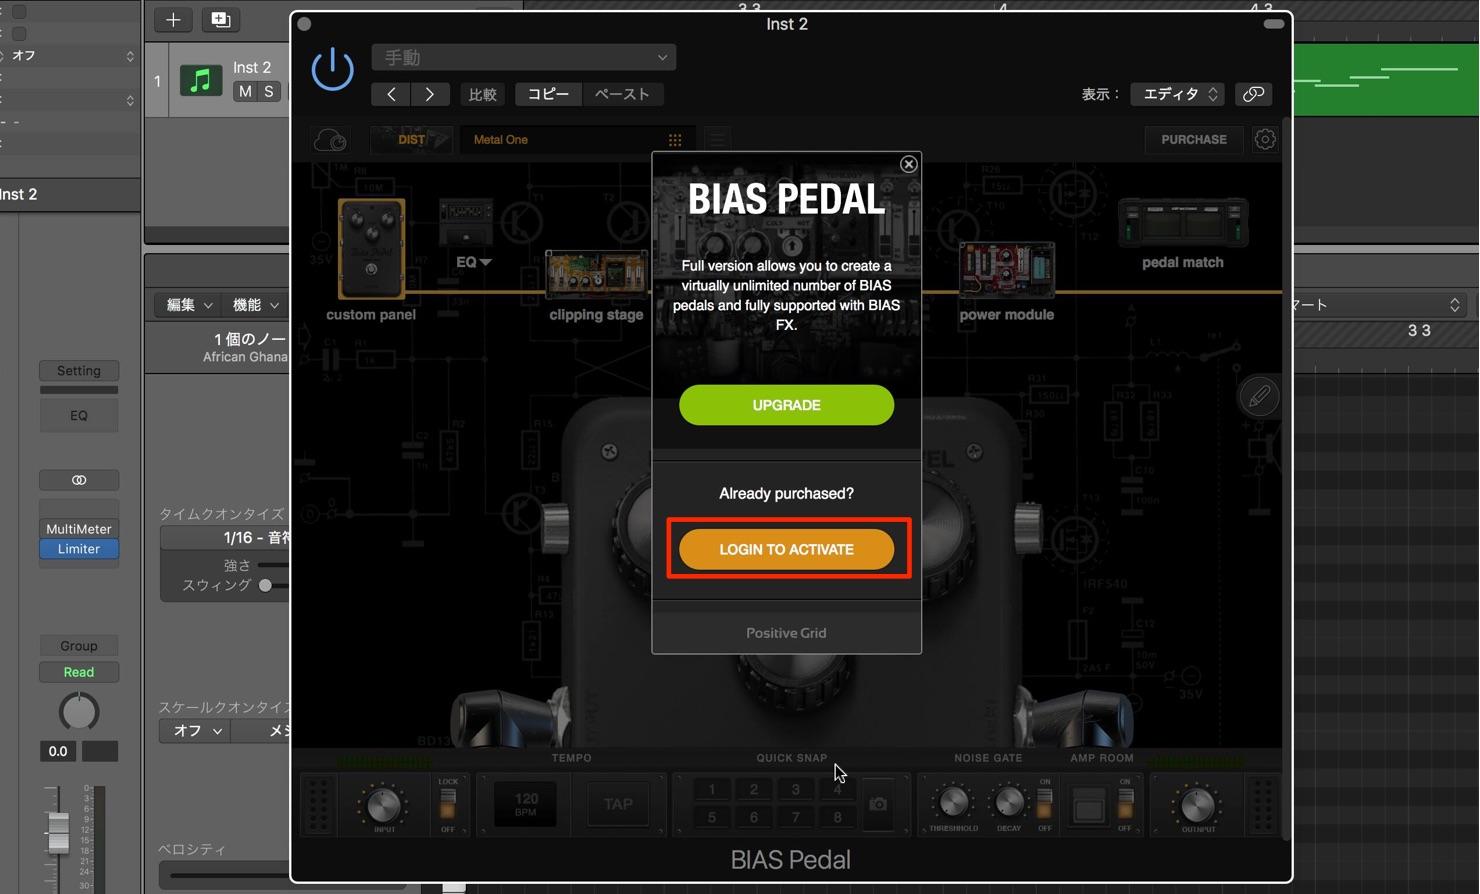 BIAS PEDAL DELAY-free-download-7